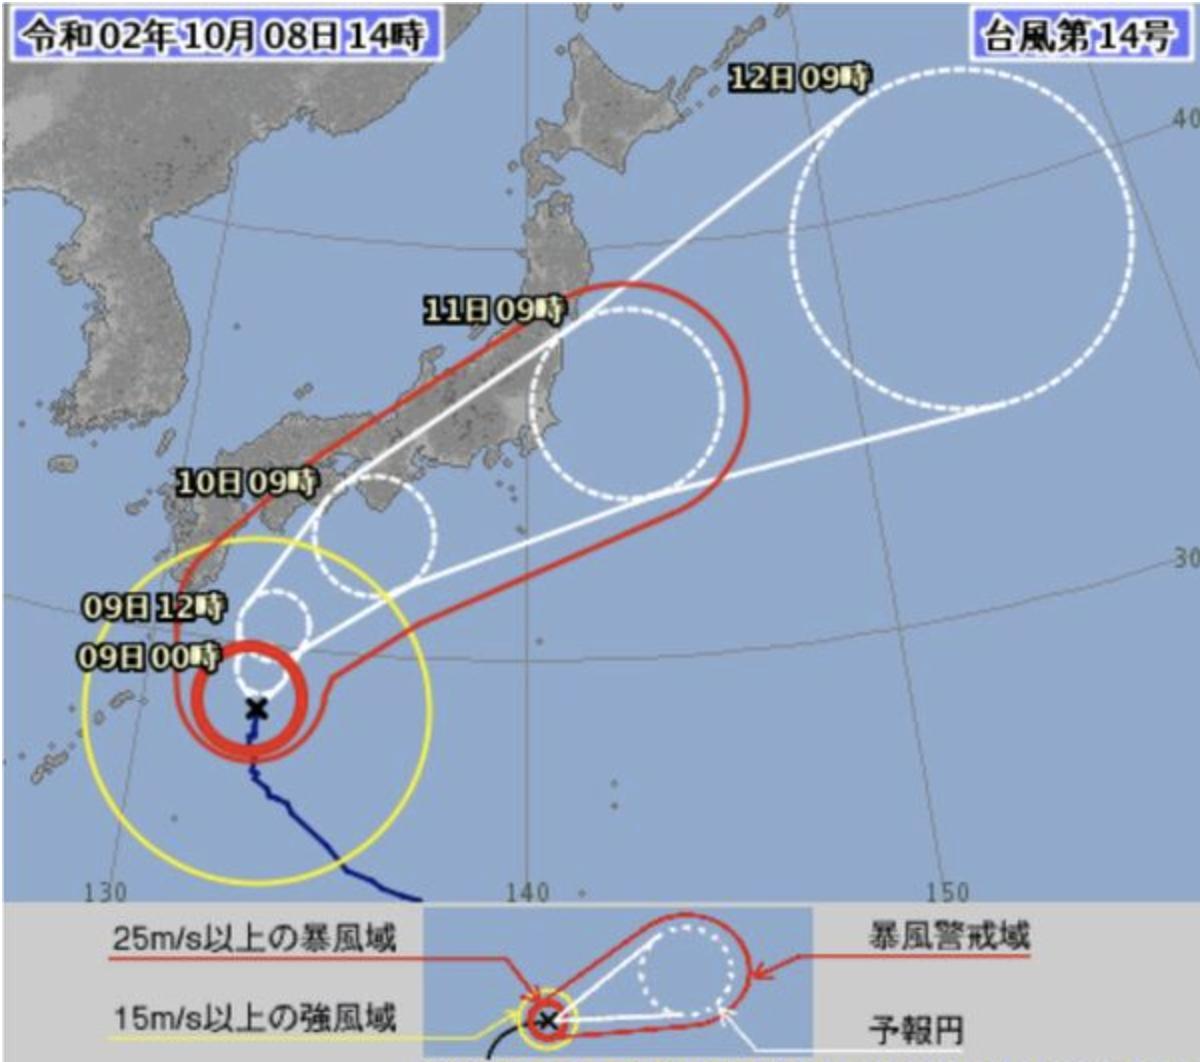 f:id:tatsunori-matsuda:20201016181233p:plain